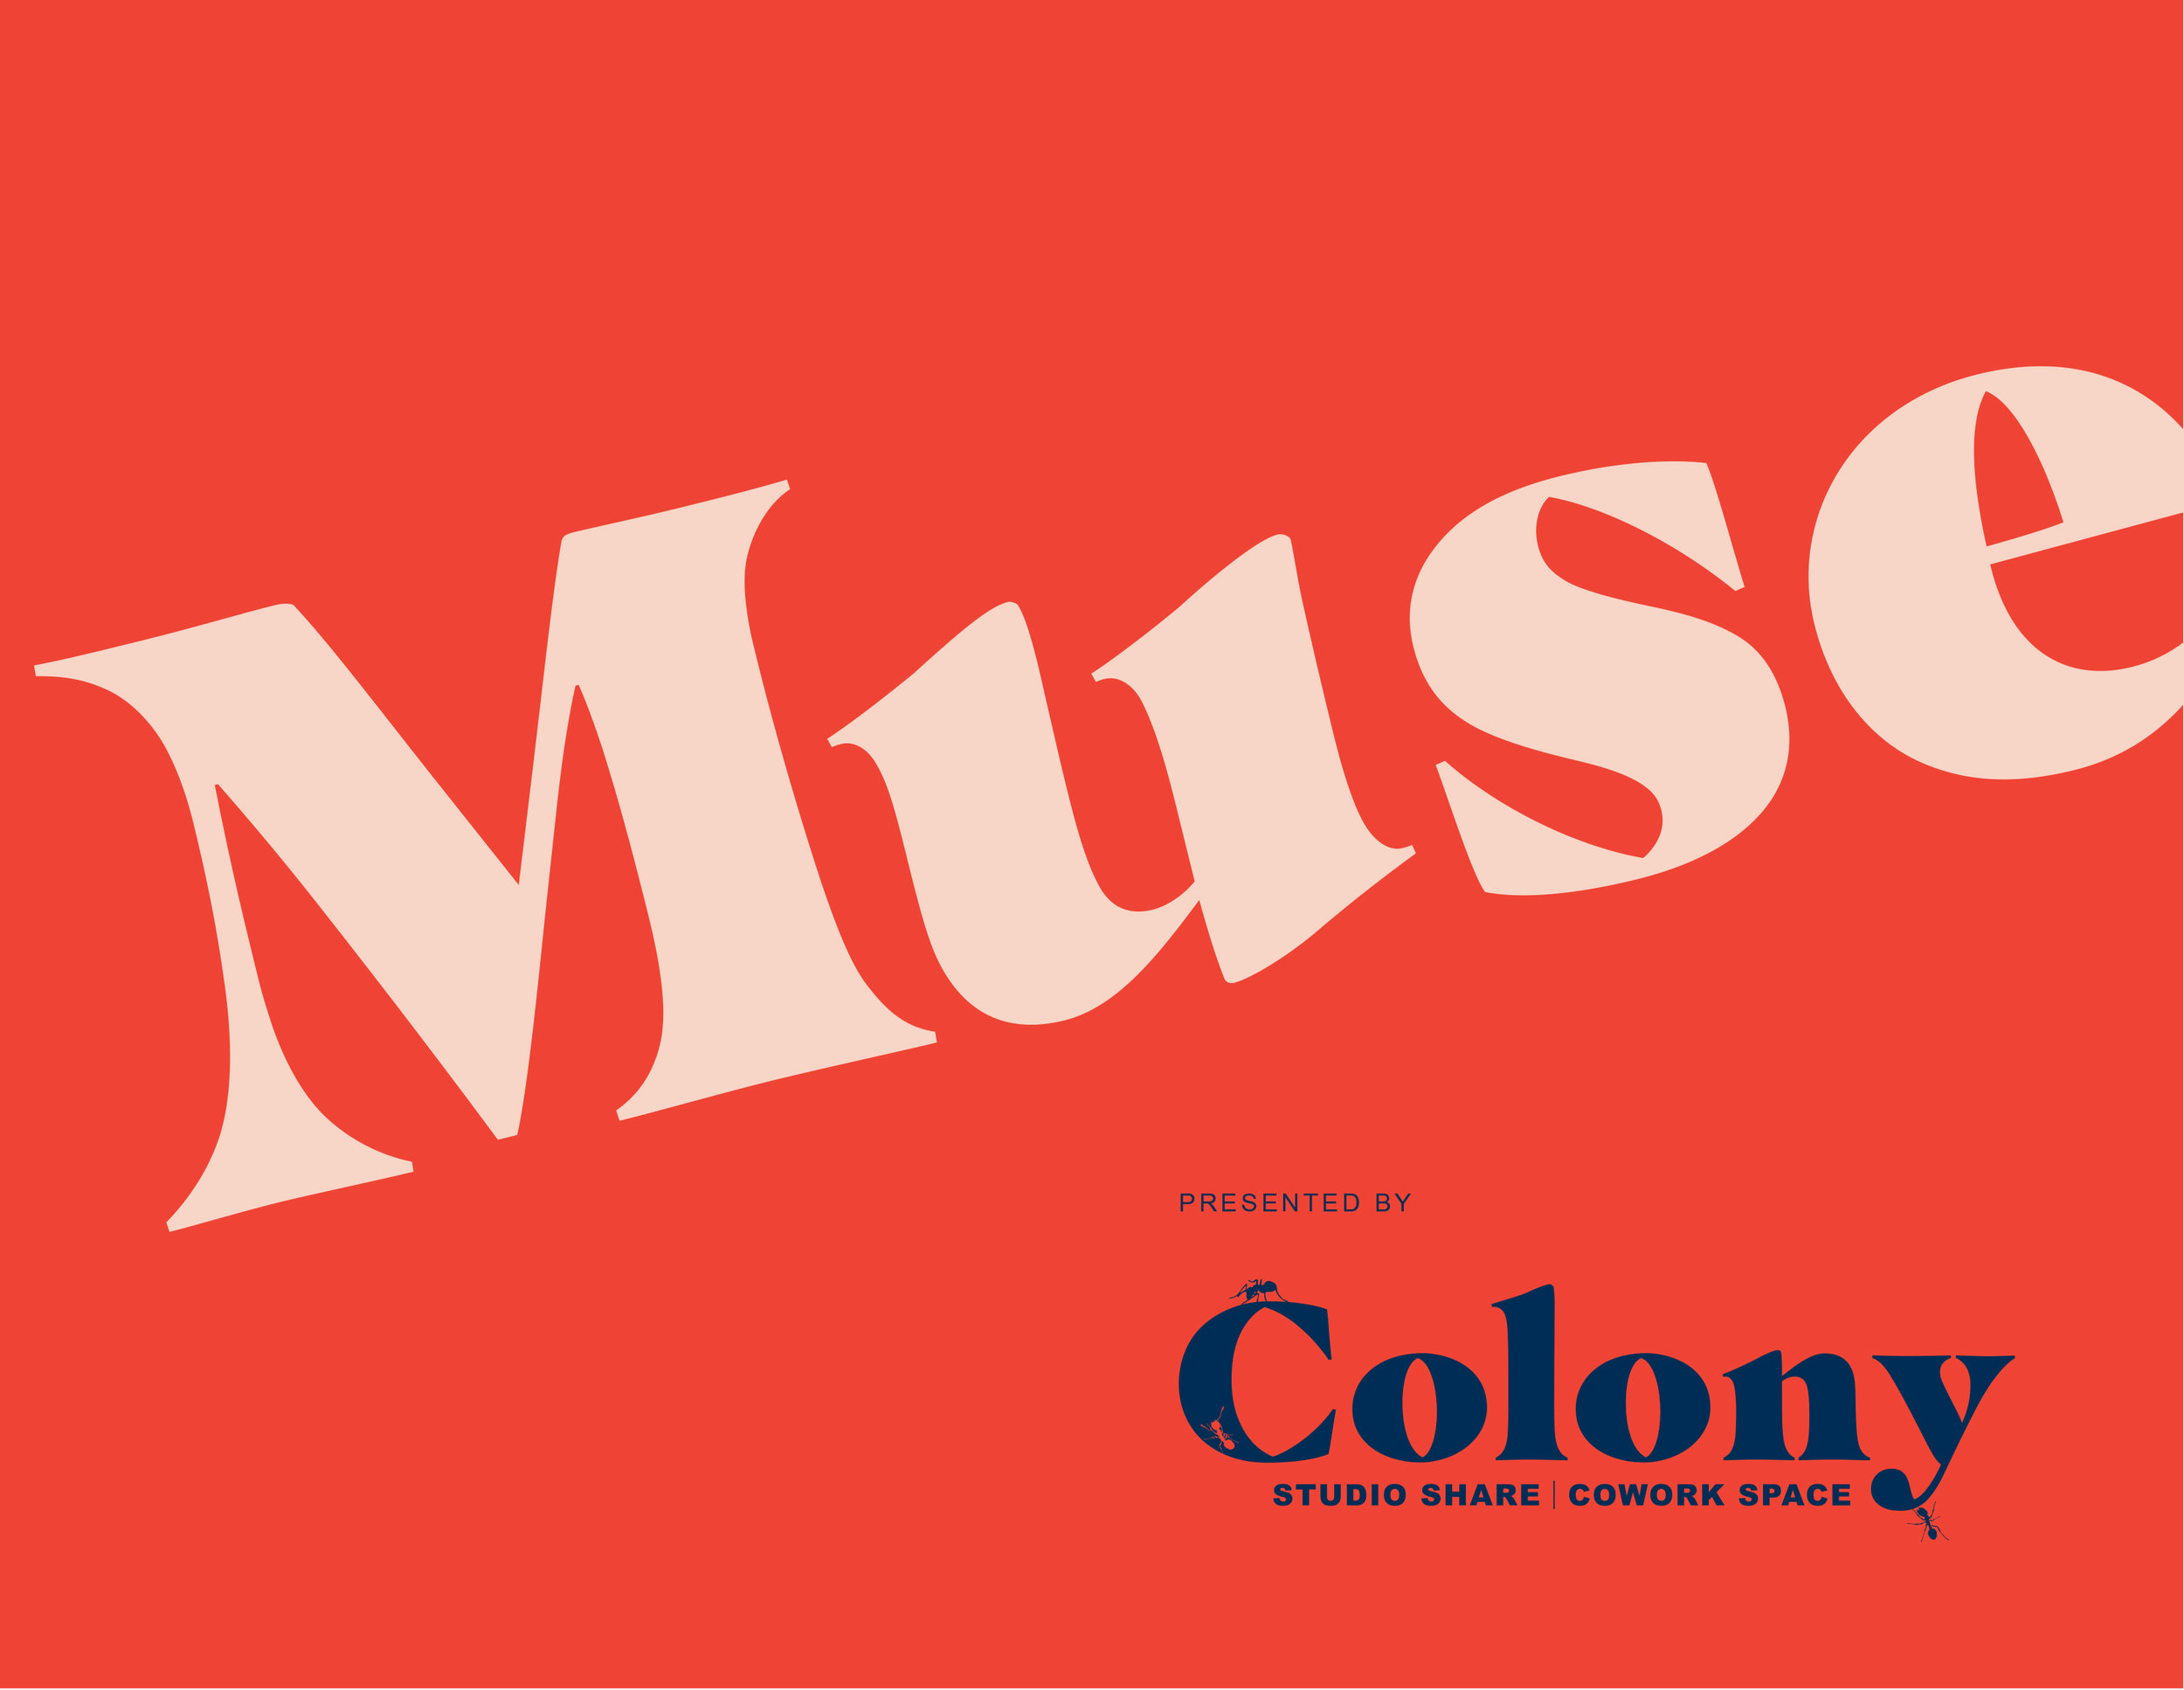 Muse2018_Graphic_Frev.jpg